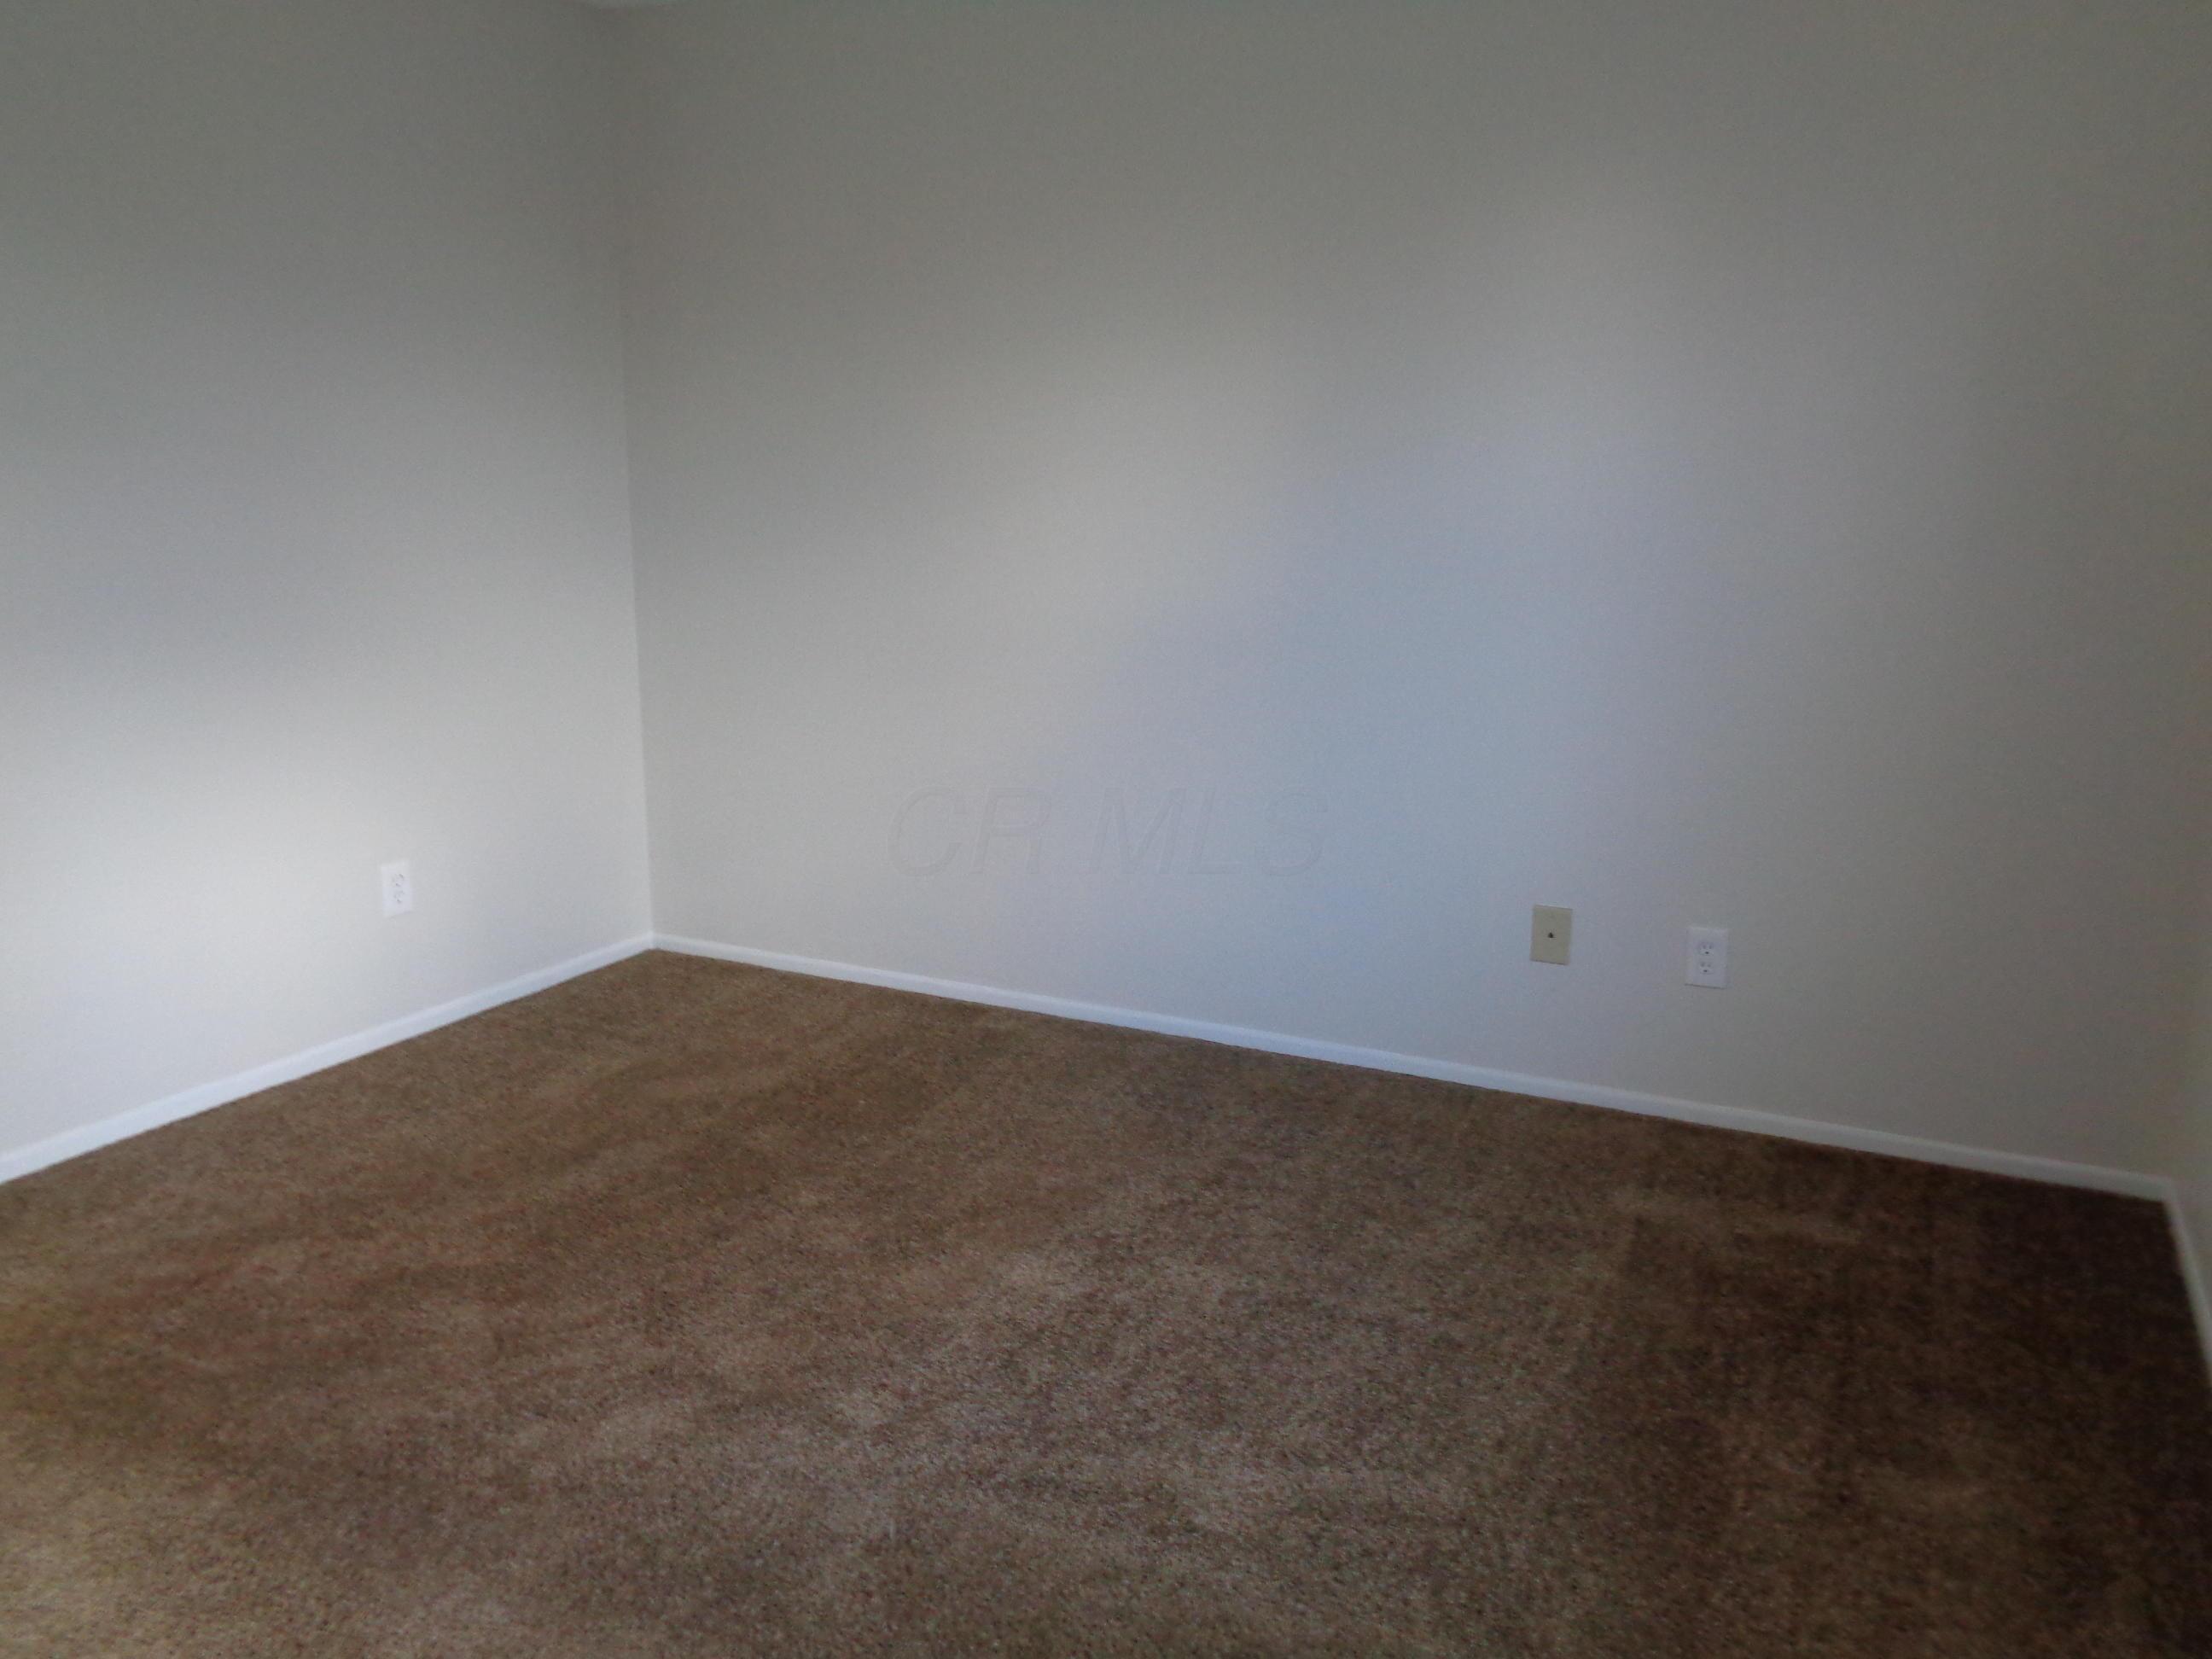 5005 Stoneybrook Boulevard, Hilliard, Ohio 43026, 2 Bedrooms Bedrooms, ,2 BathroomsBathrooms,Residential,For Sale,Stoneybrook,220038679